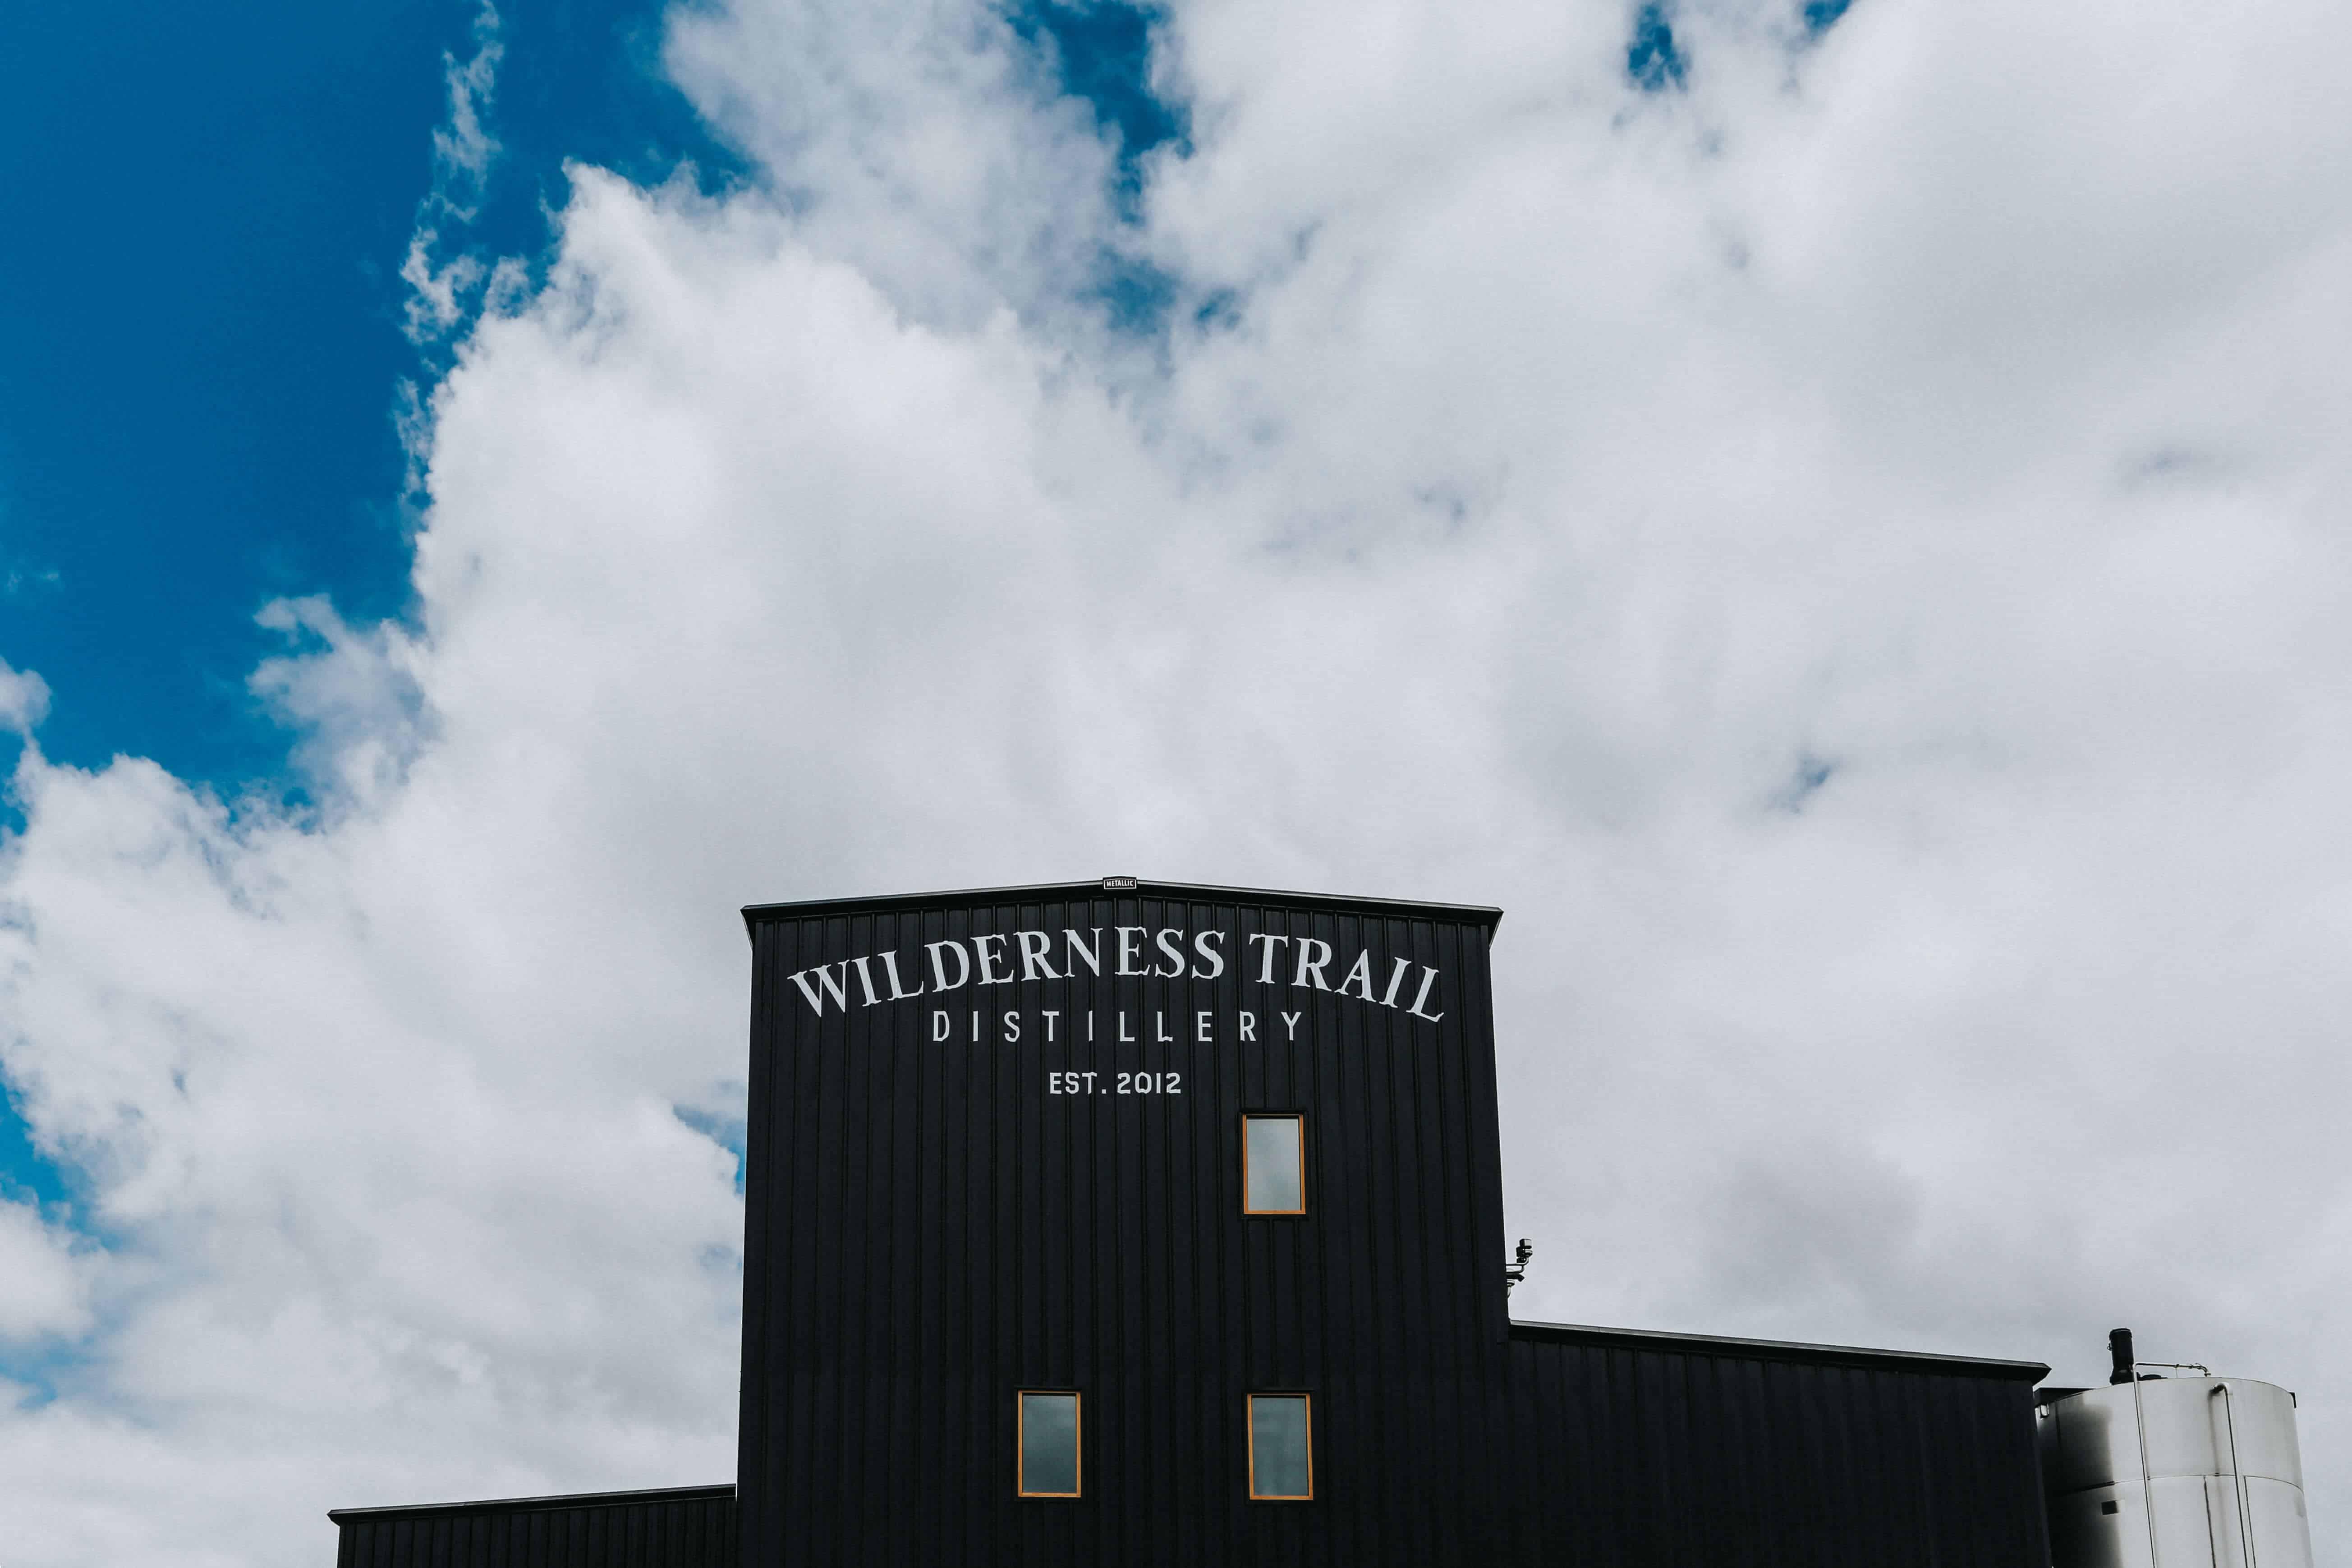 wilderness distillery sky - The Early Pioneers